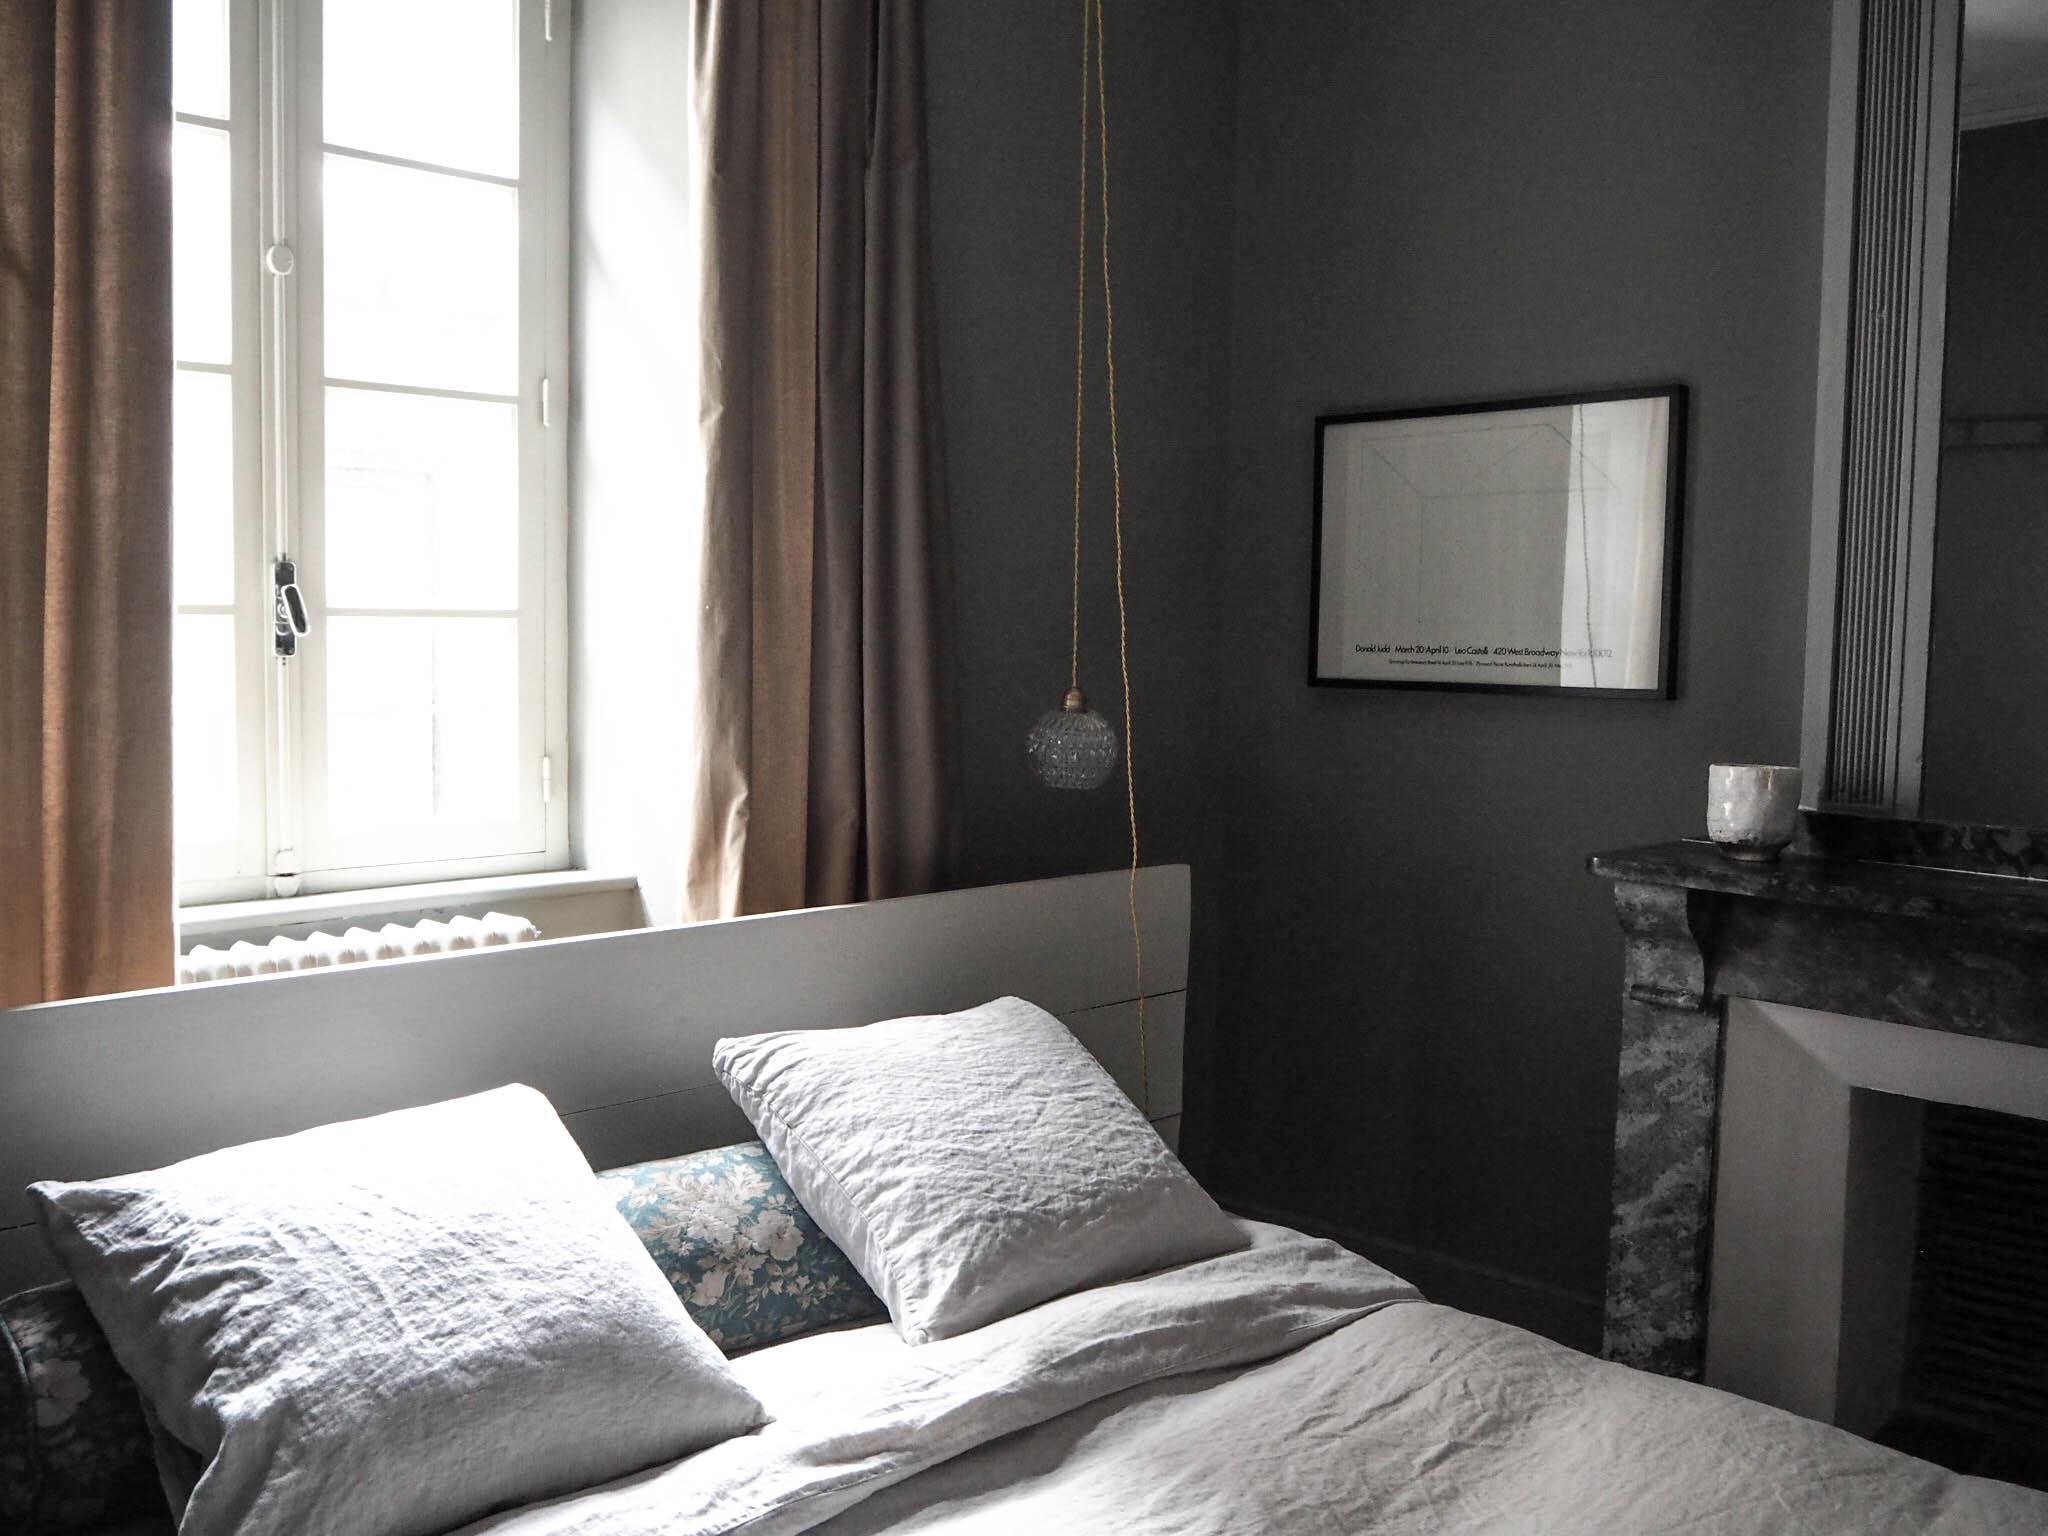 camellas-lloret-maison-d'hotes-room-2-bed.jpg